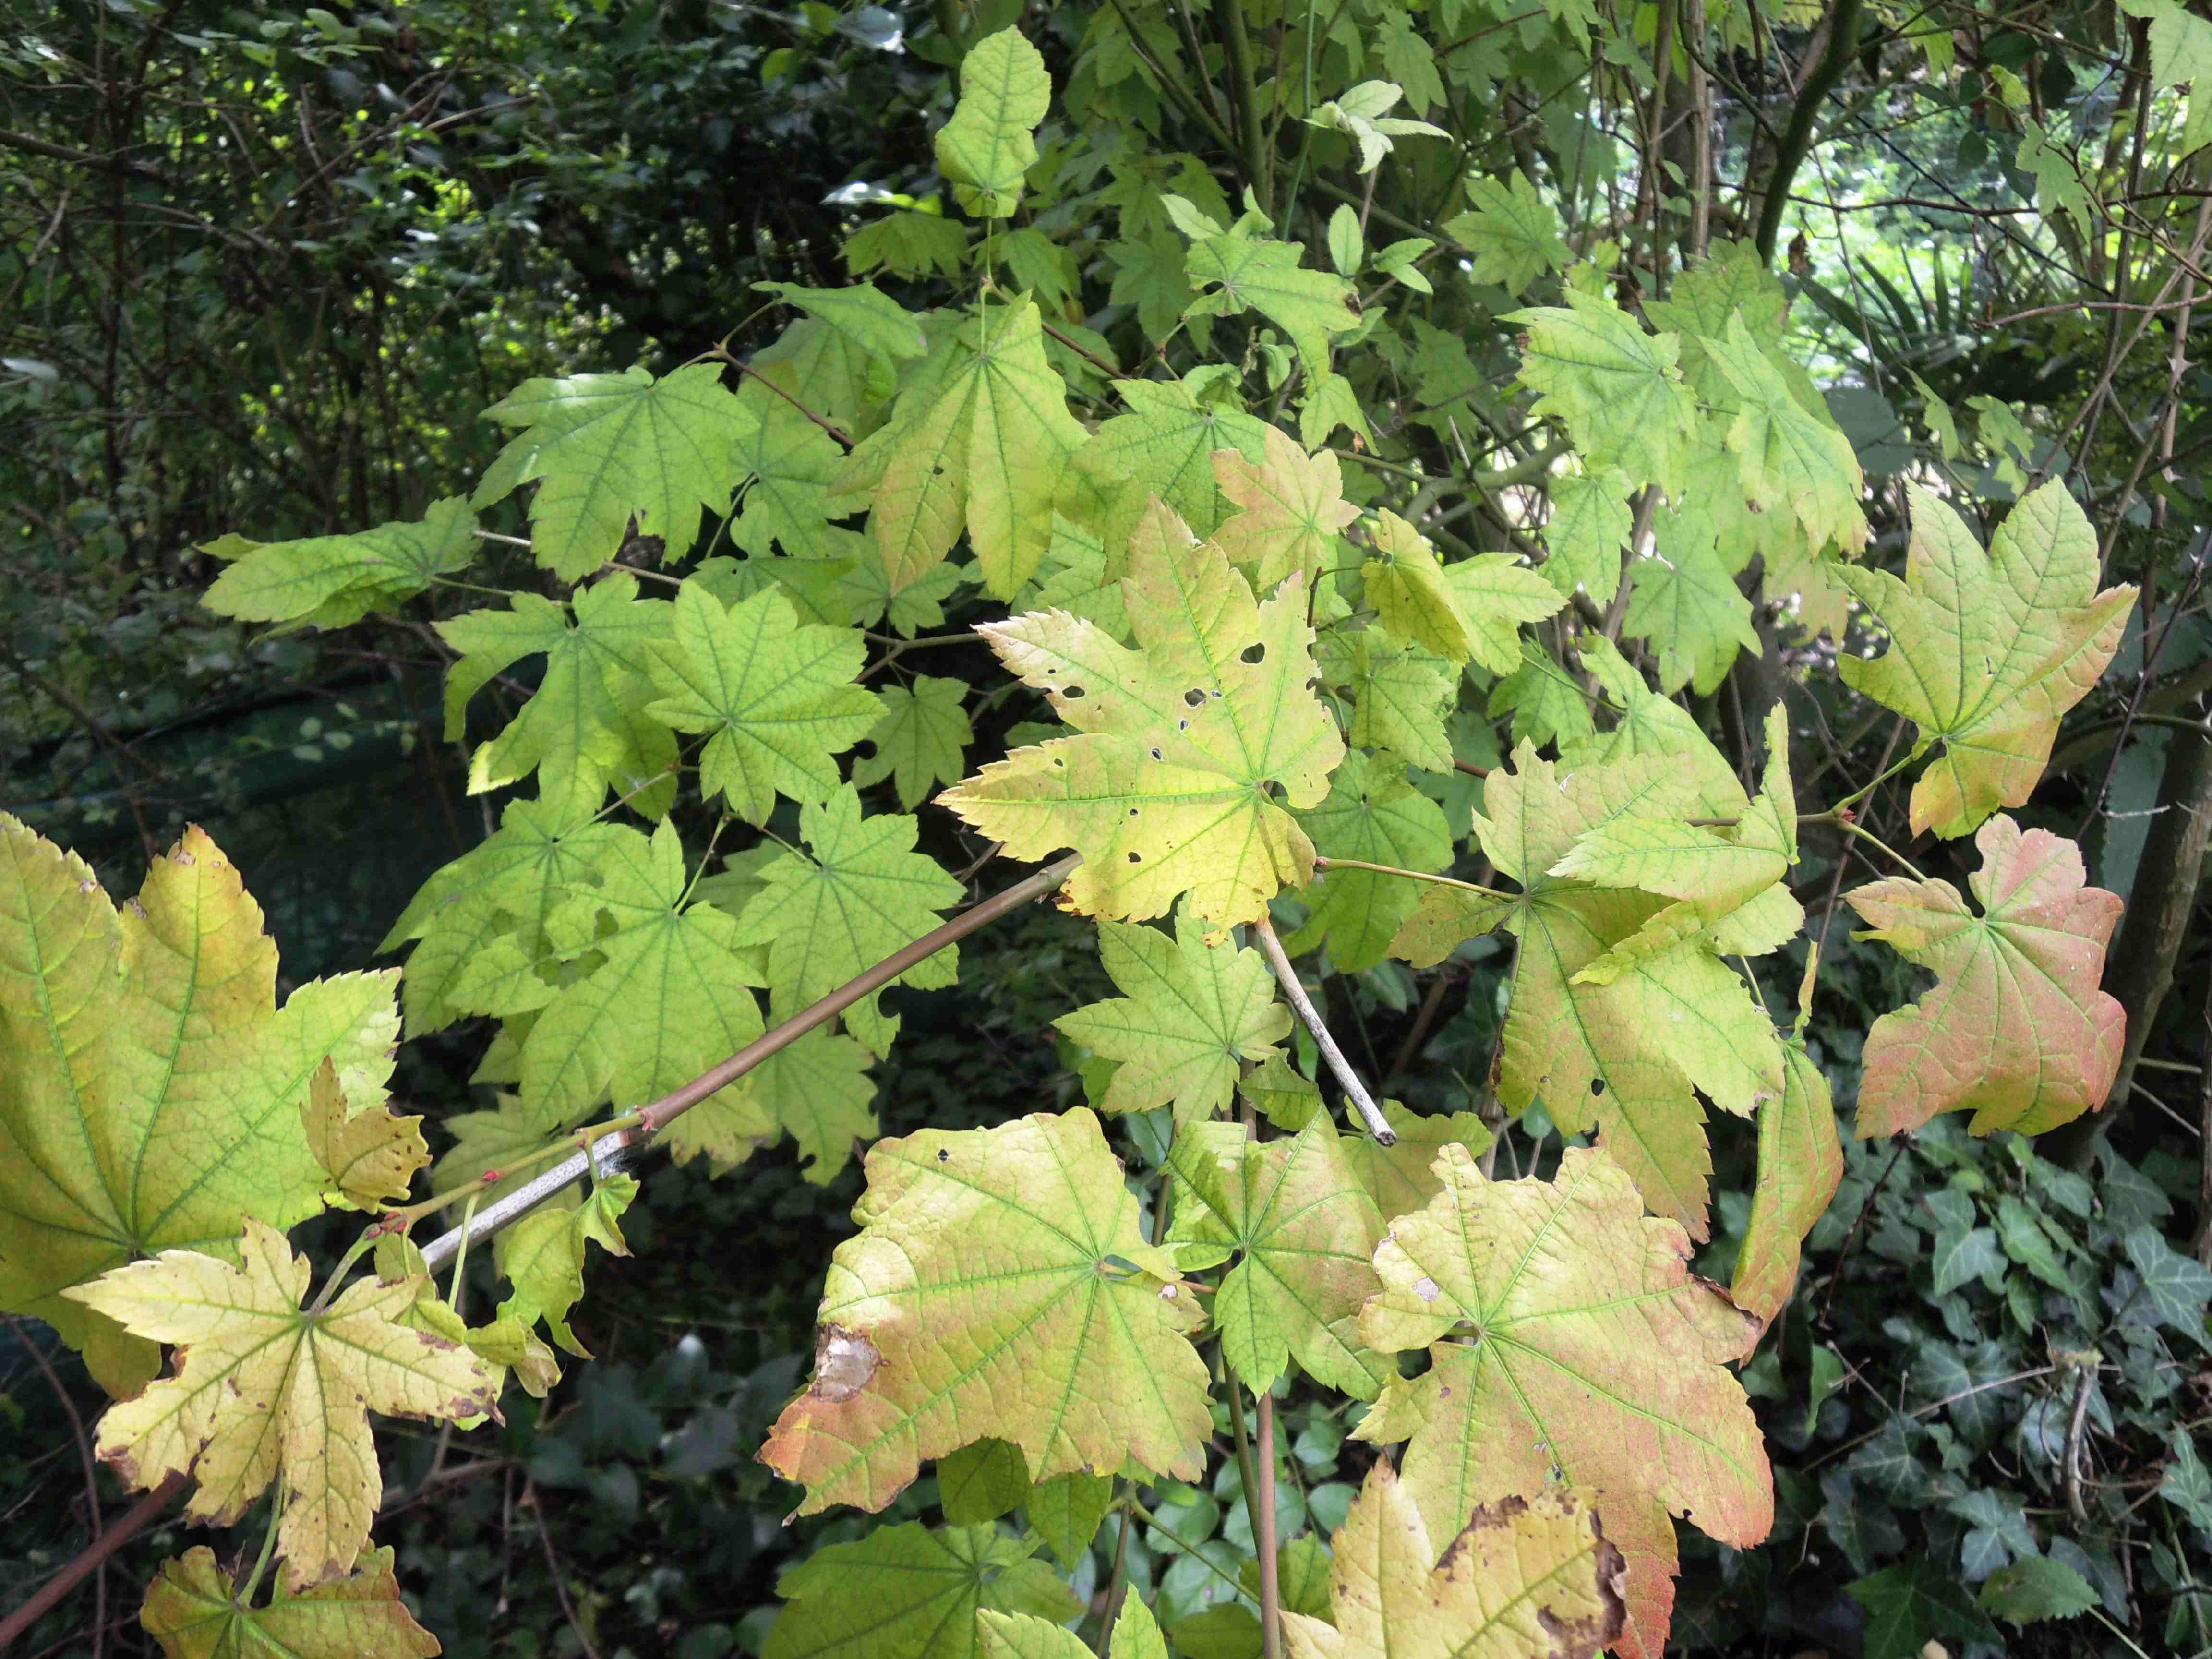 Acer Circinatum(Feuilles) Acéracées. - Copie